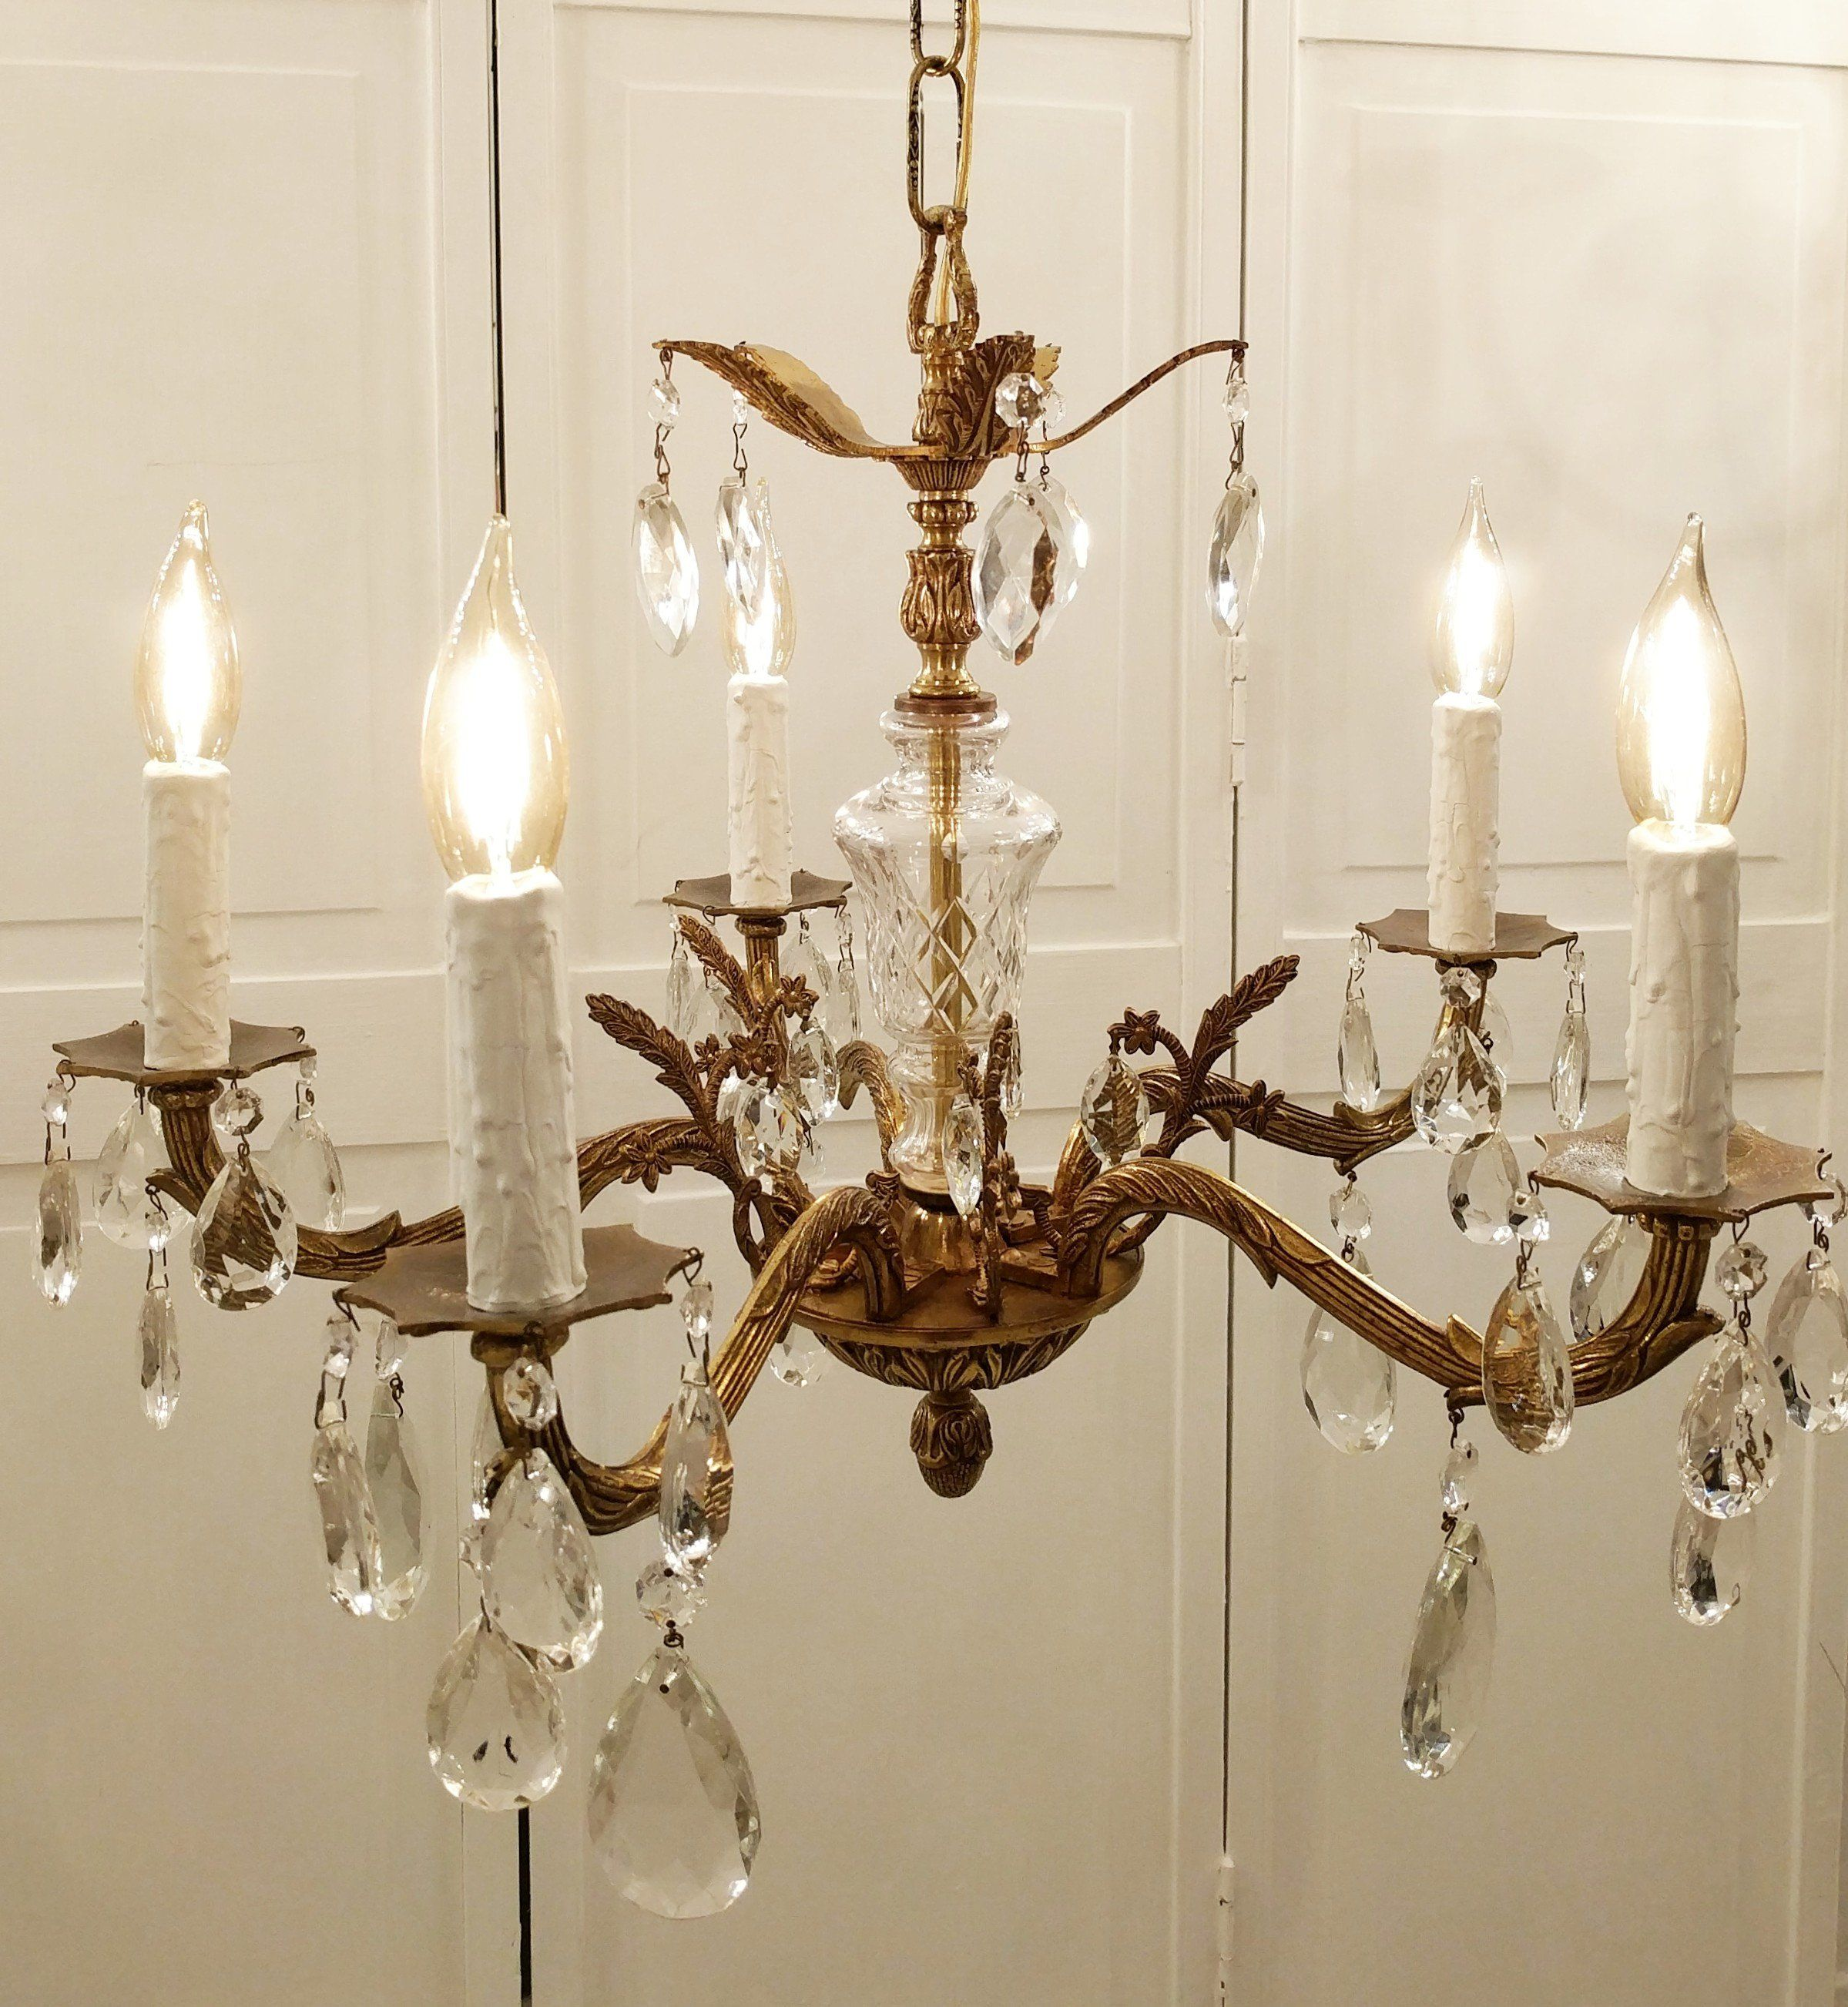 Vintage Chandelier Chandelier Lighting Bespoke Lighting Spanish Brass Chandelier Crystal Chande Vintage Chandelier Lighting Inspiration Chandelier Lighting